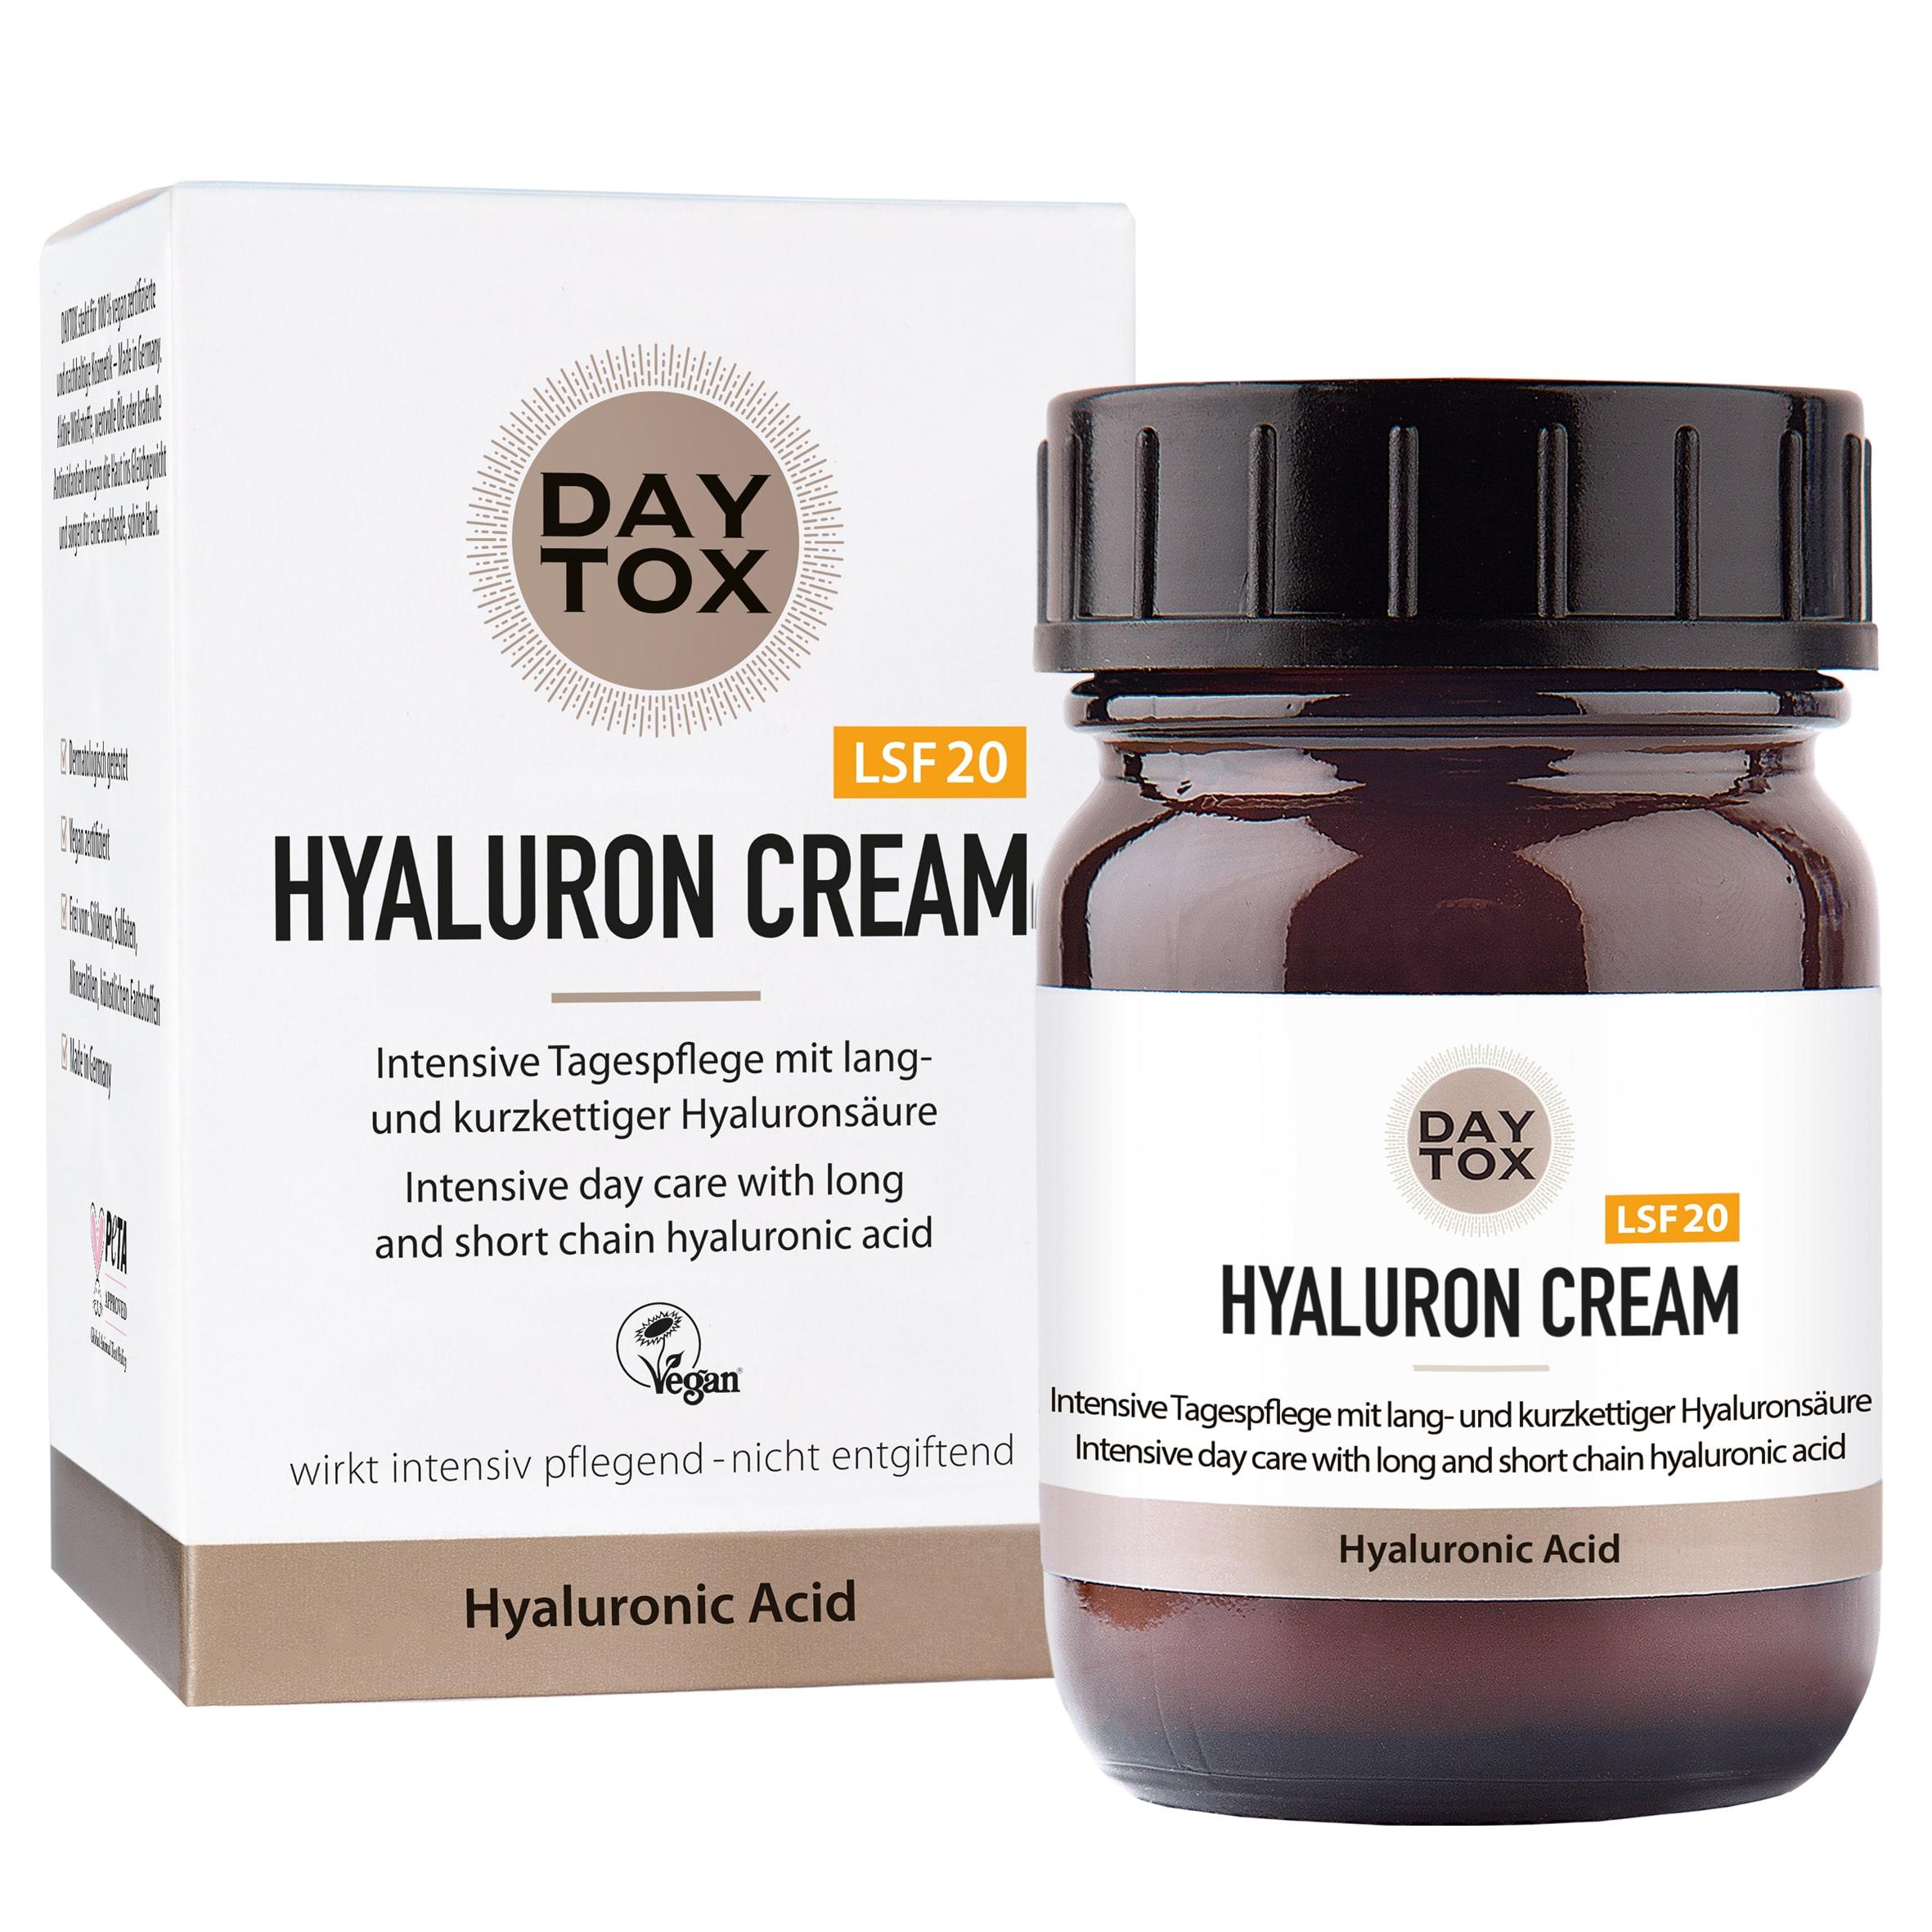 DAYTOX Hyaluron Cream LSF20